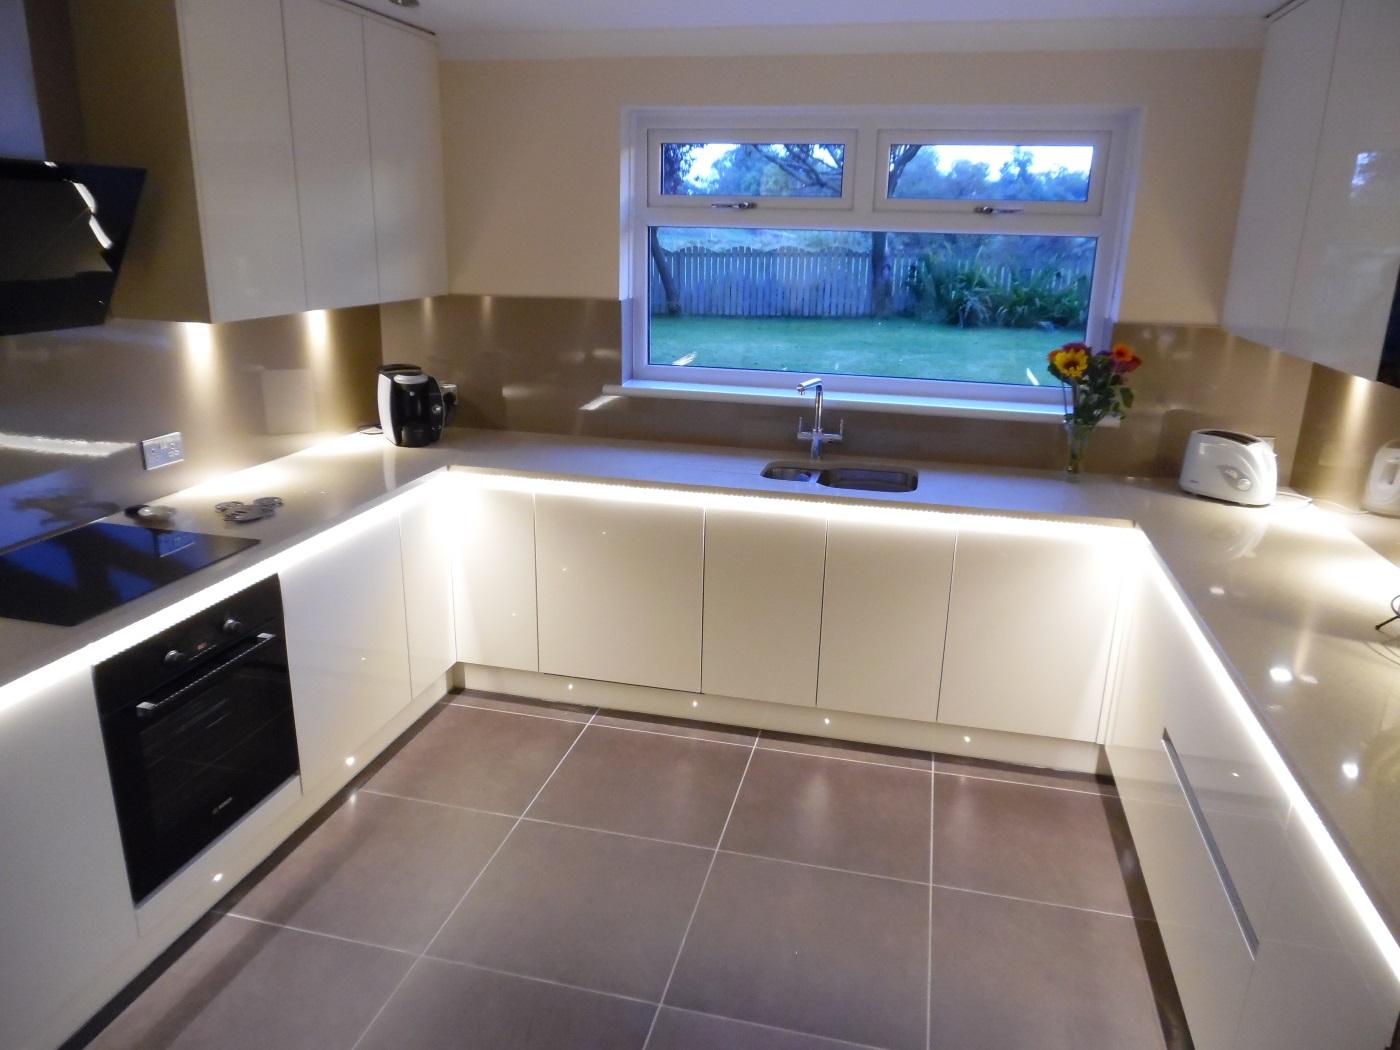 Finished Kitchen Installation